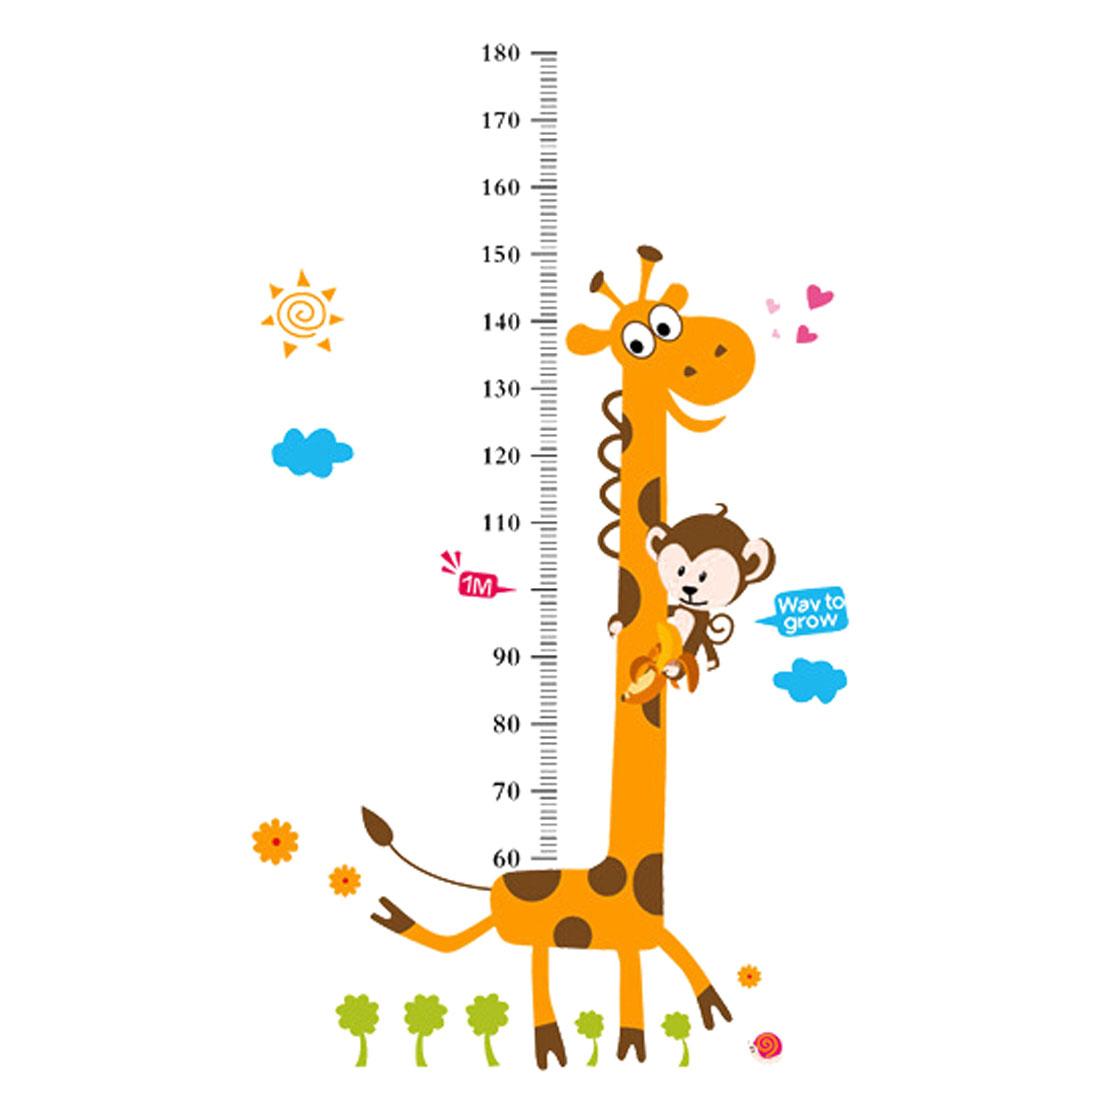 Bedroom Decor Cartoon Style Monkey Giraffe Pattern Removable Wall Sticker Decal